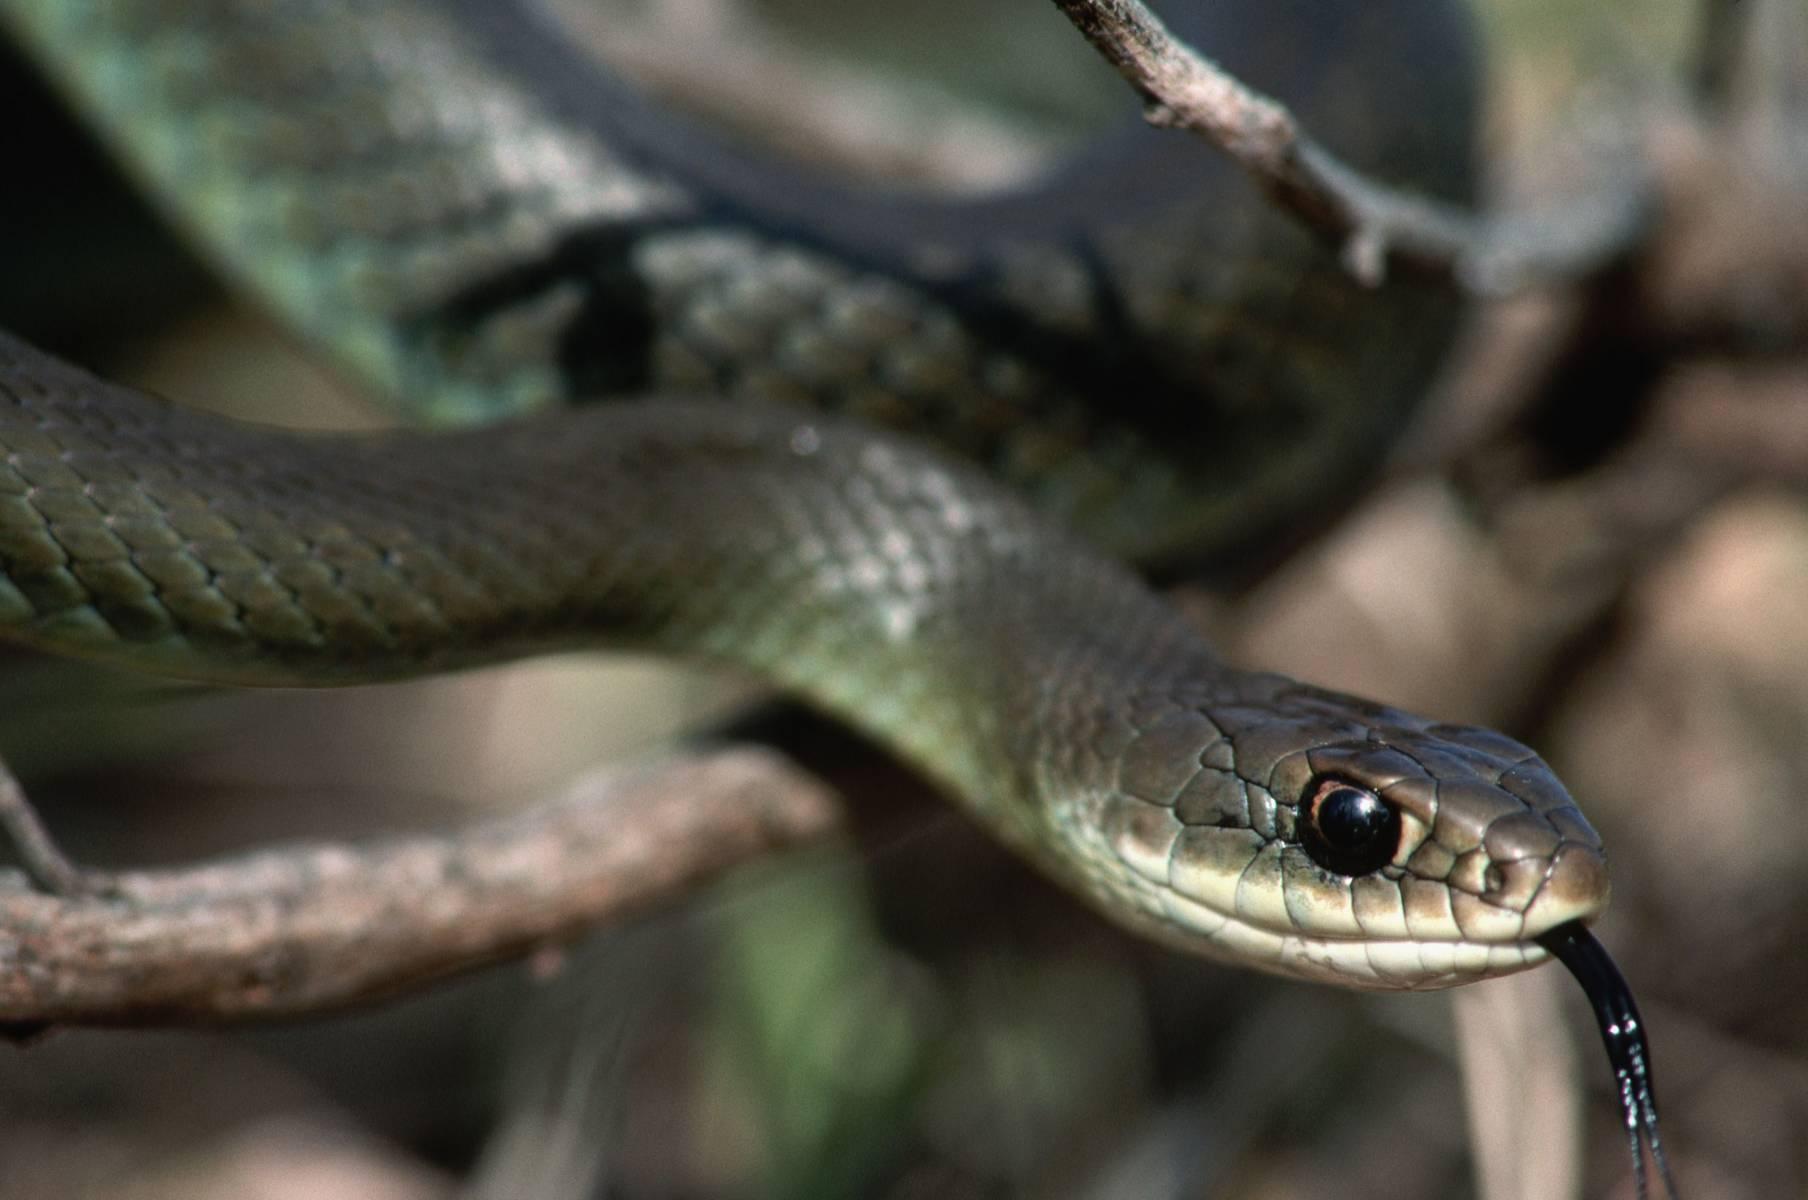 Язык как у змеи